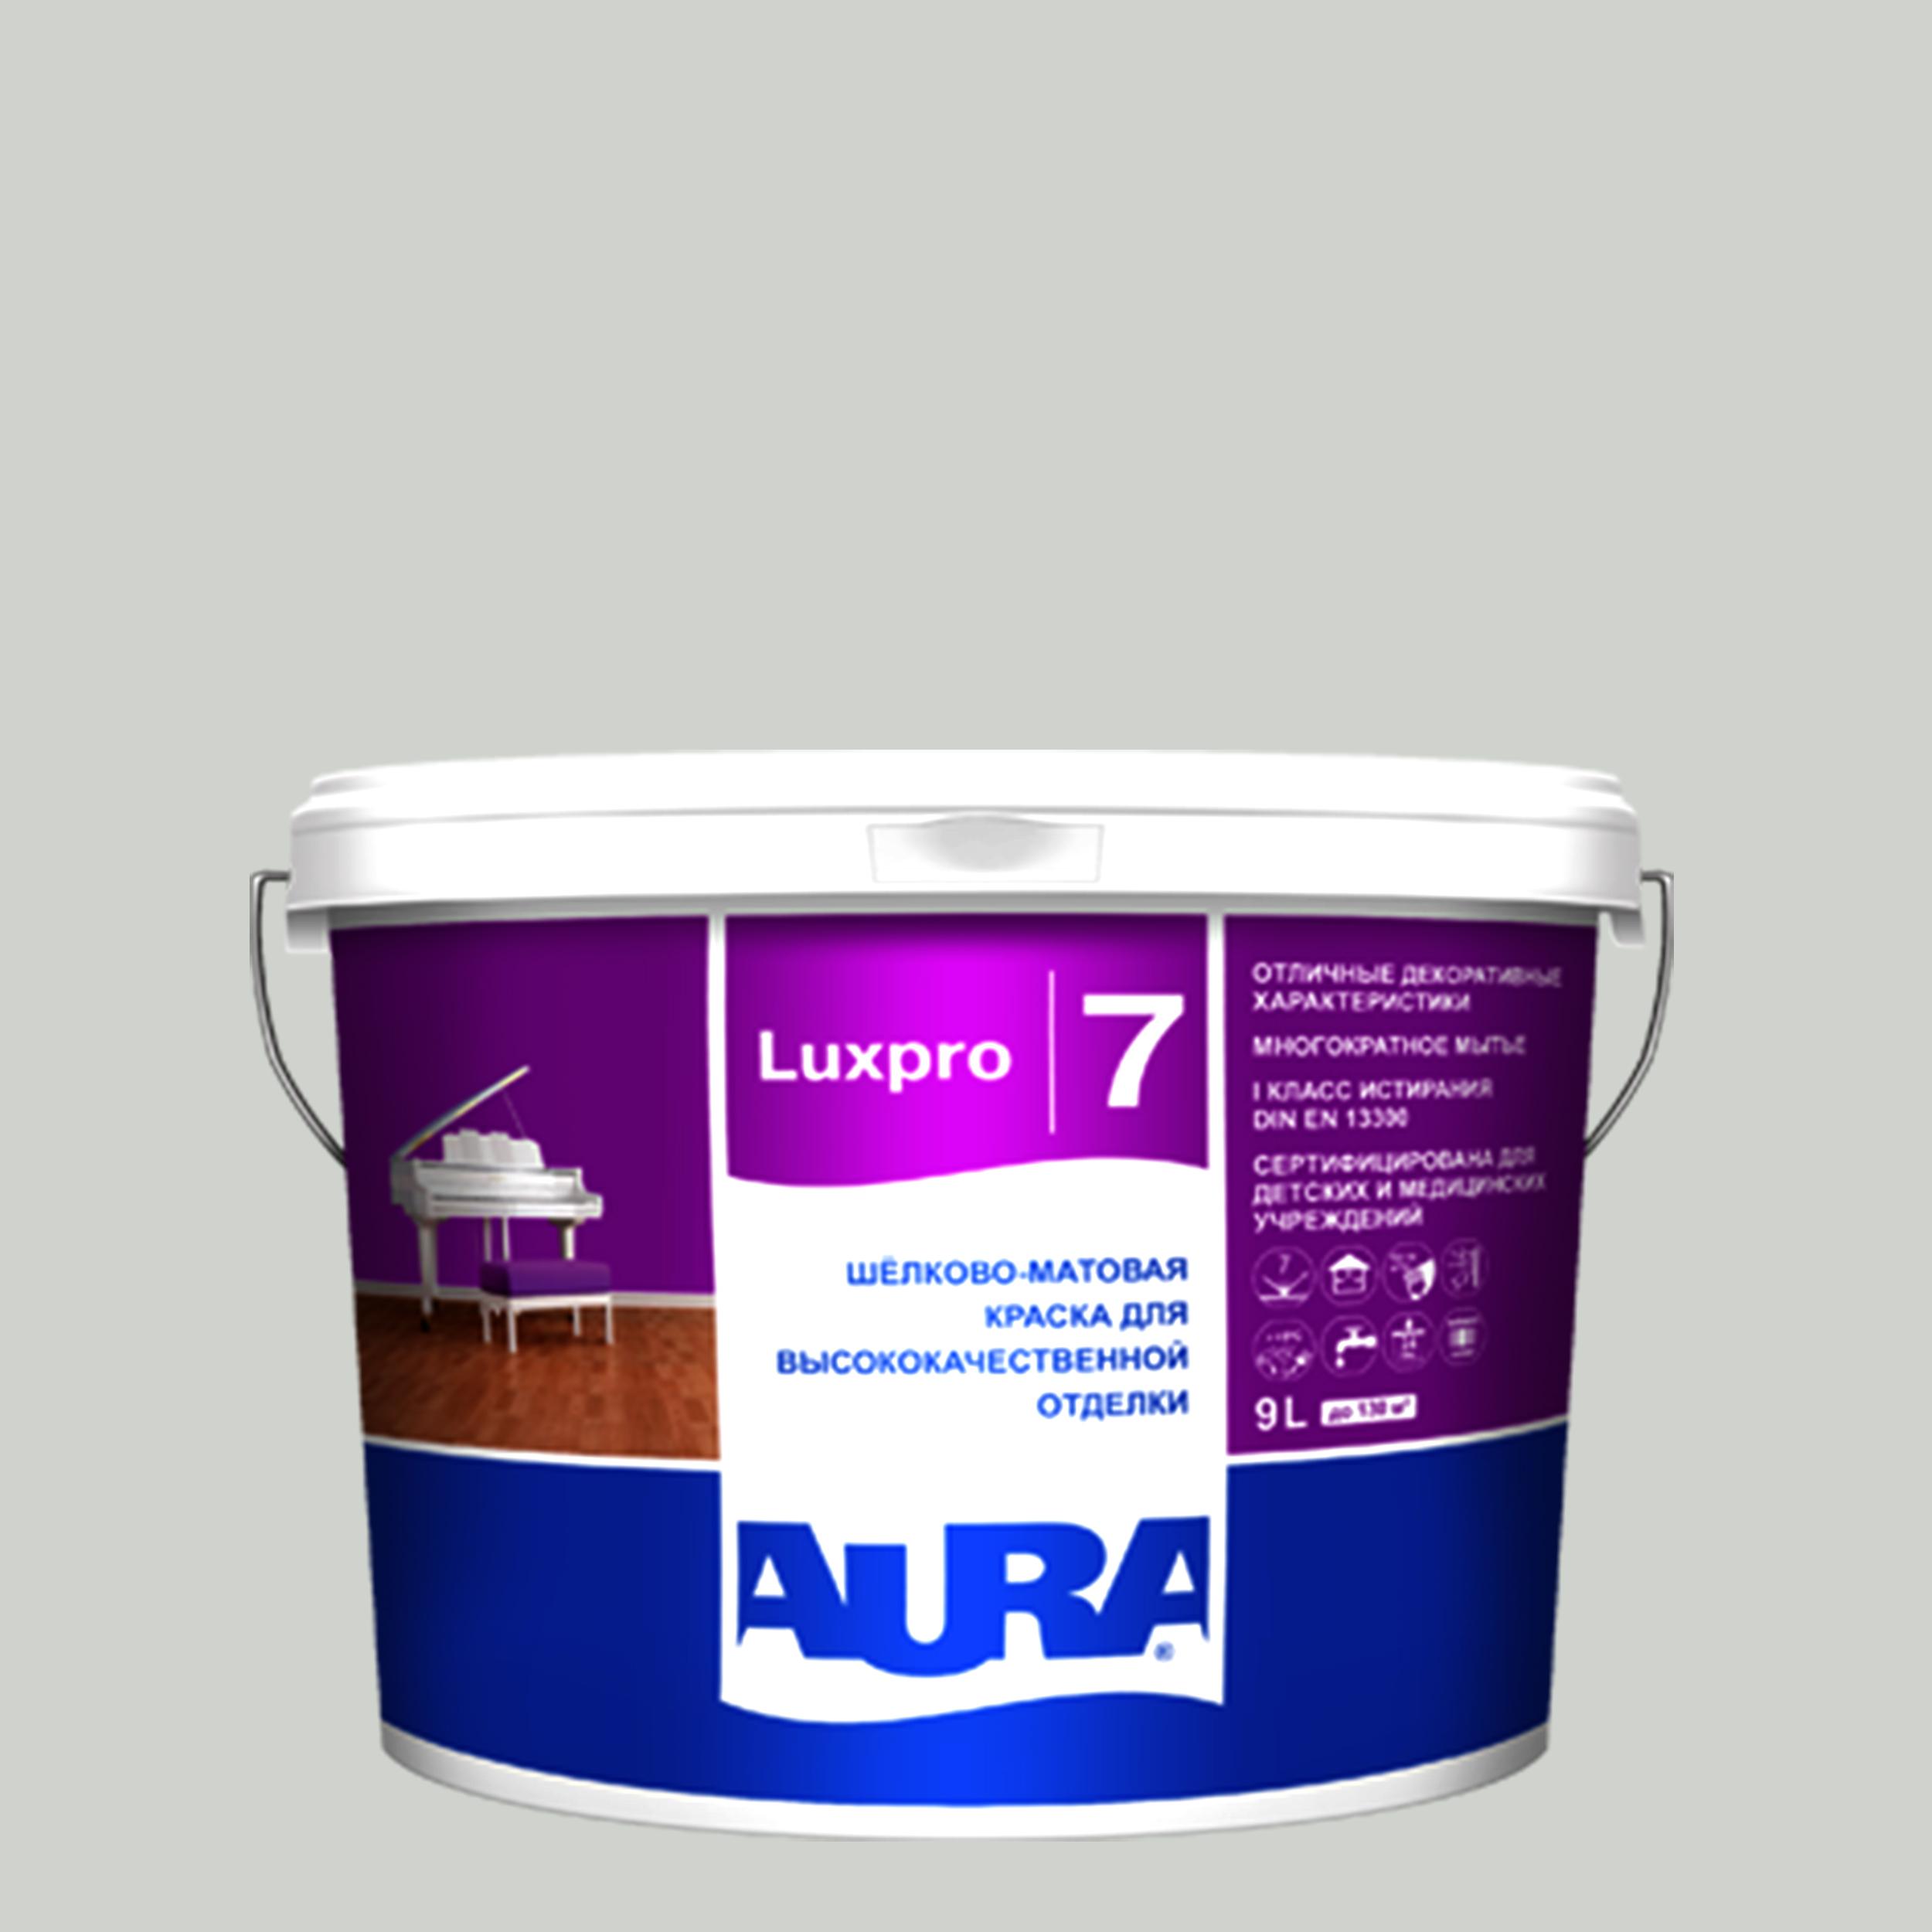 Фото 4 - Краска интерьерная, Aura LuxPRO 7, RAL 6022, 11 кг.